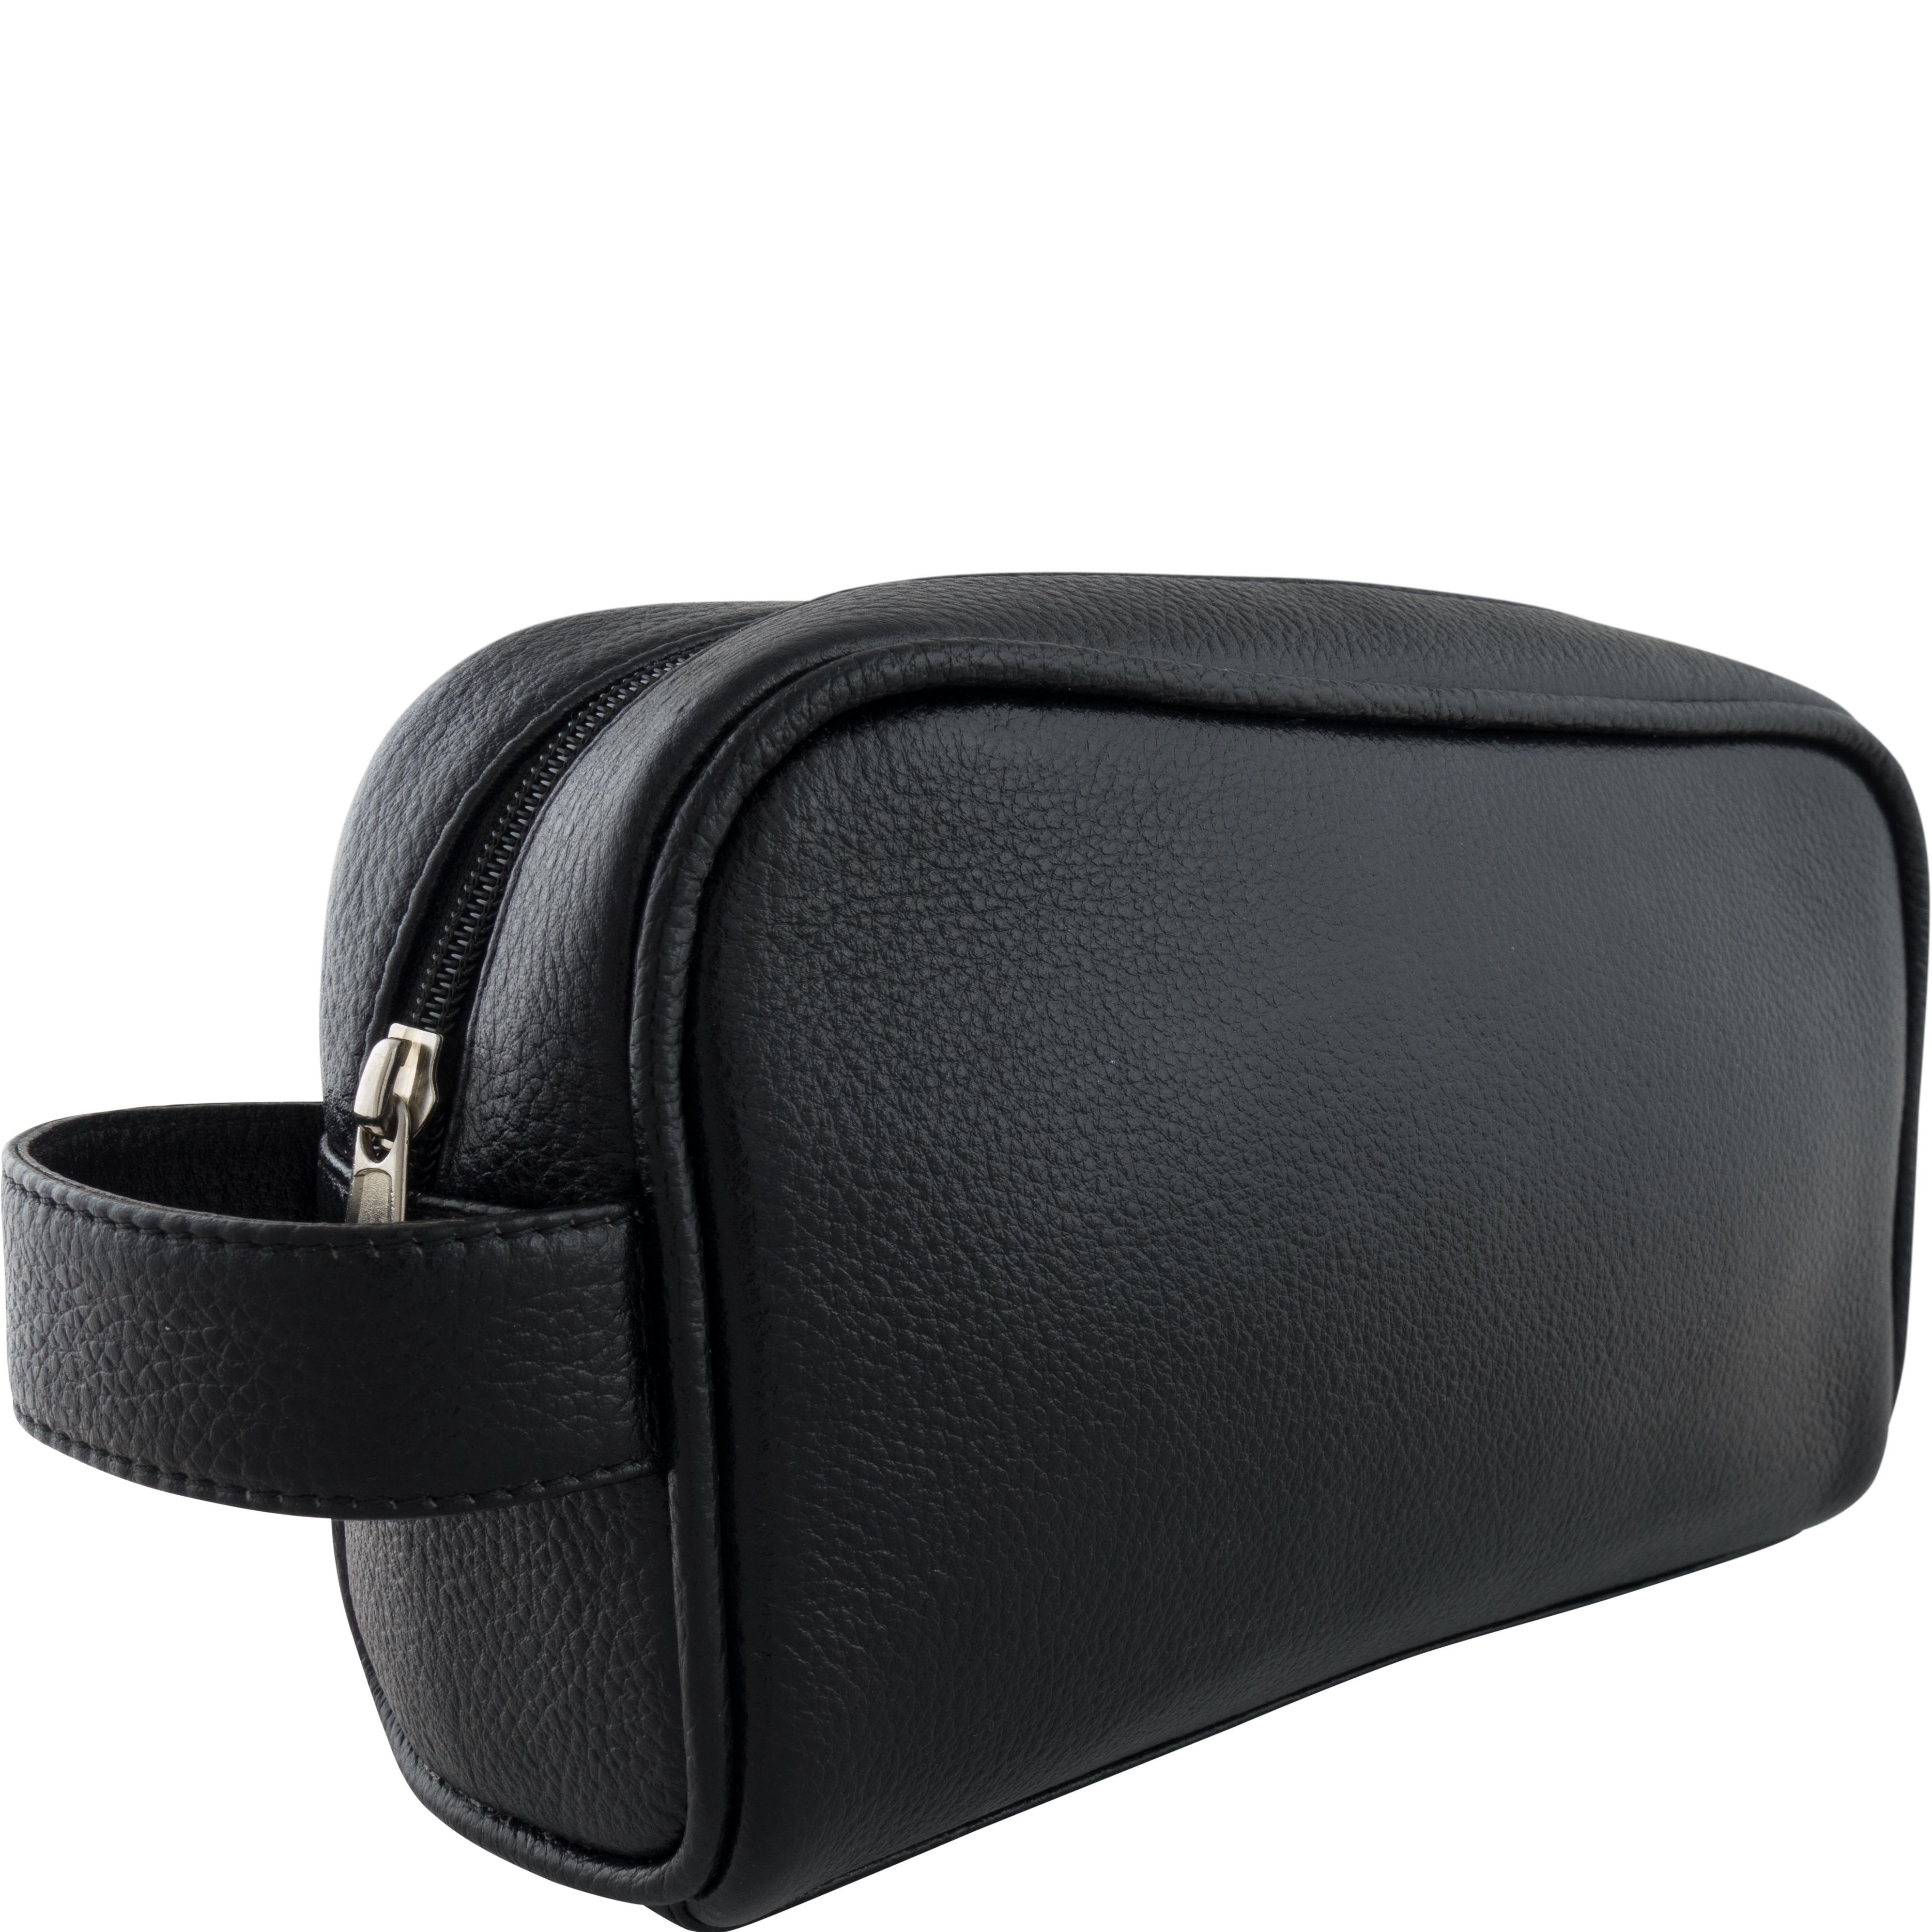 Luxe Toilettas in zwart leder